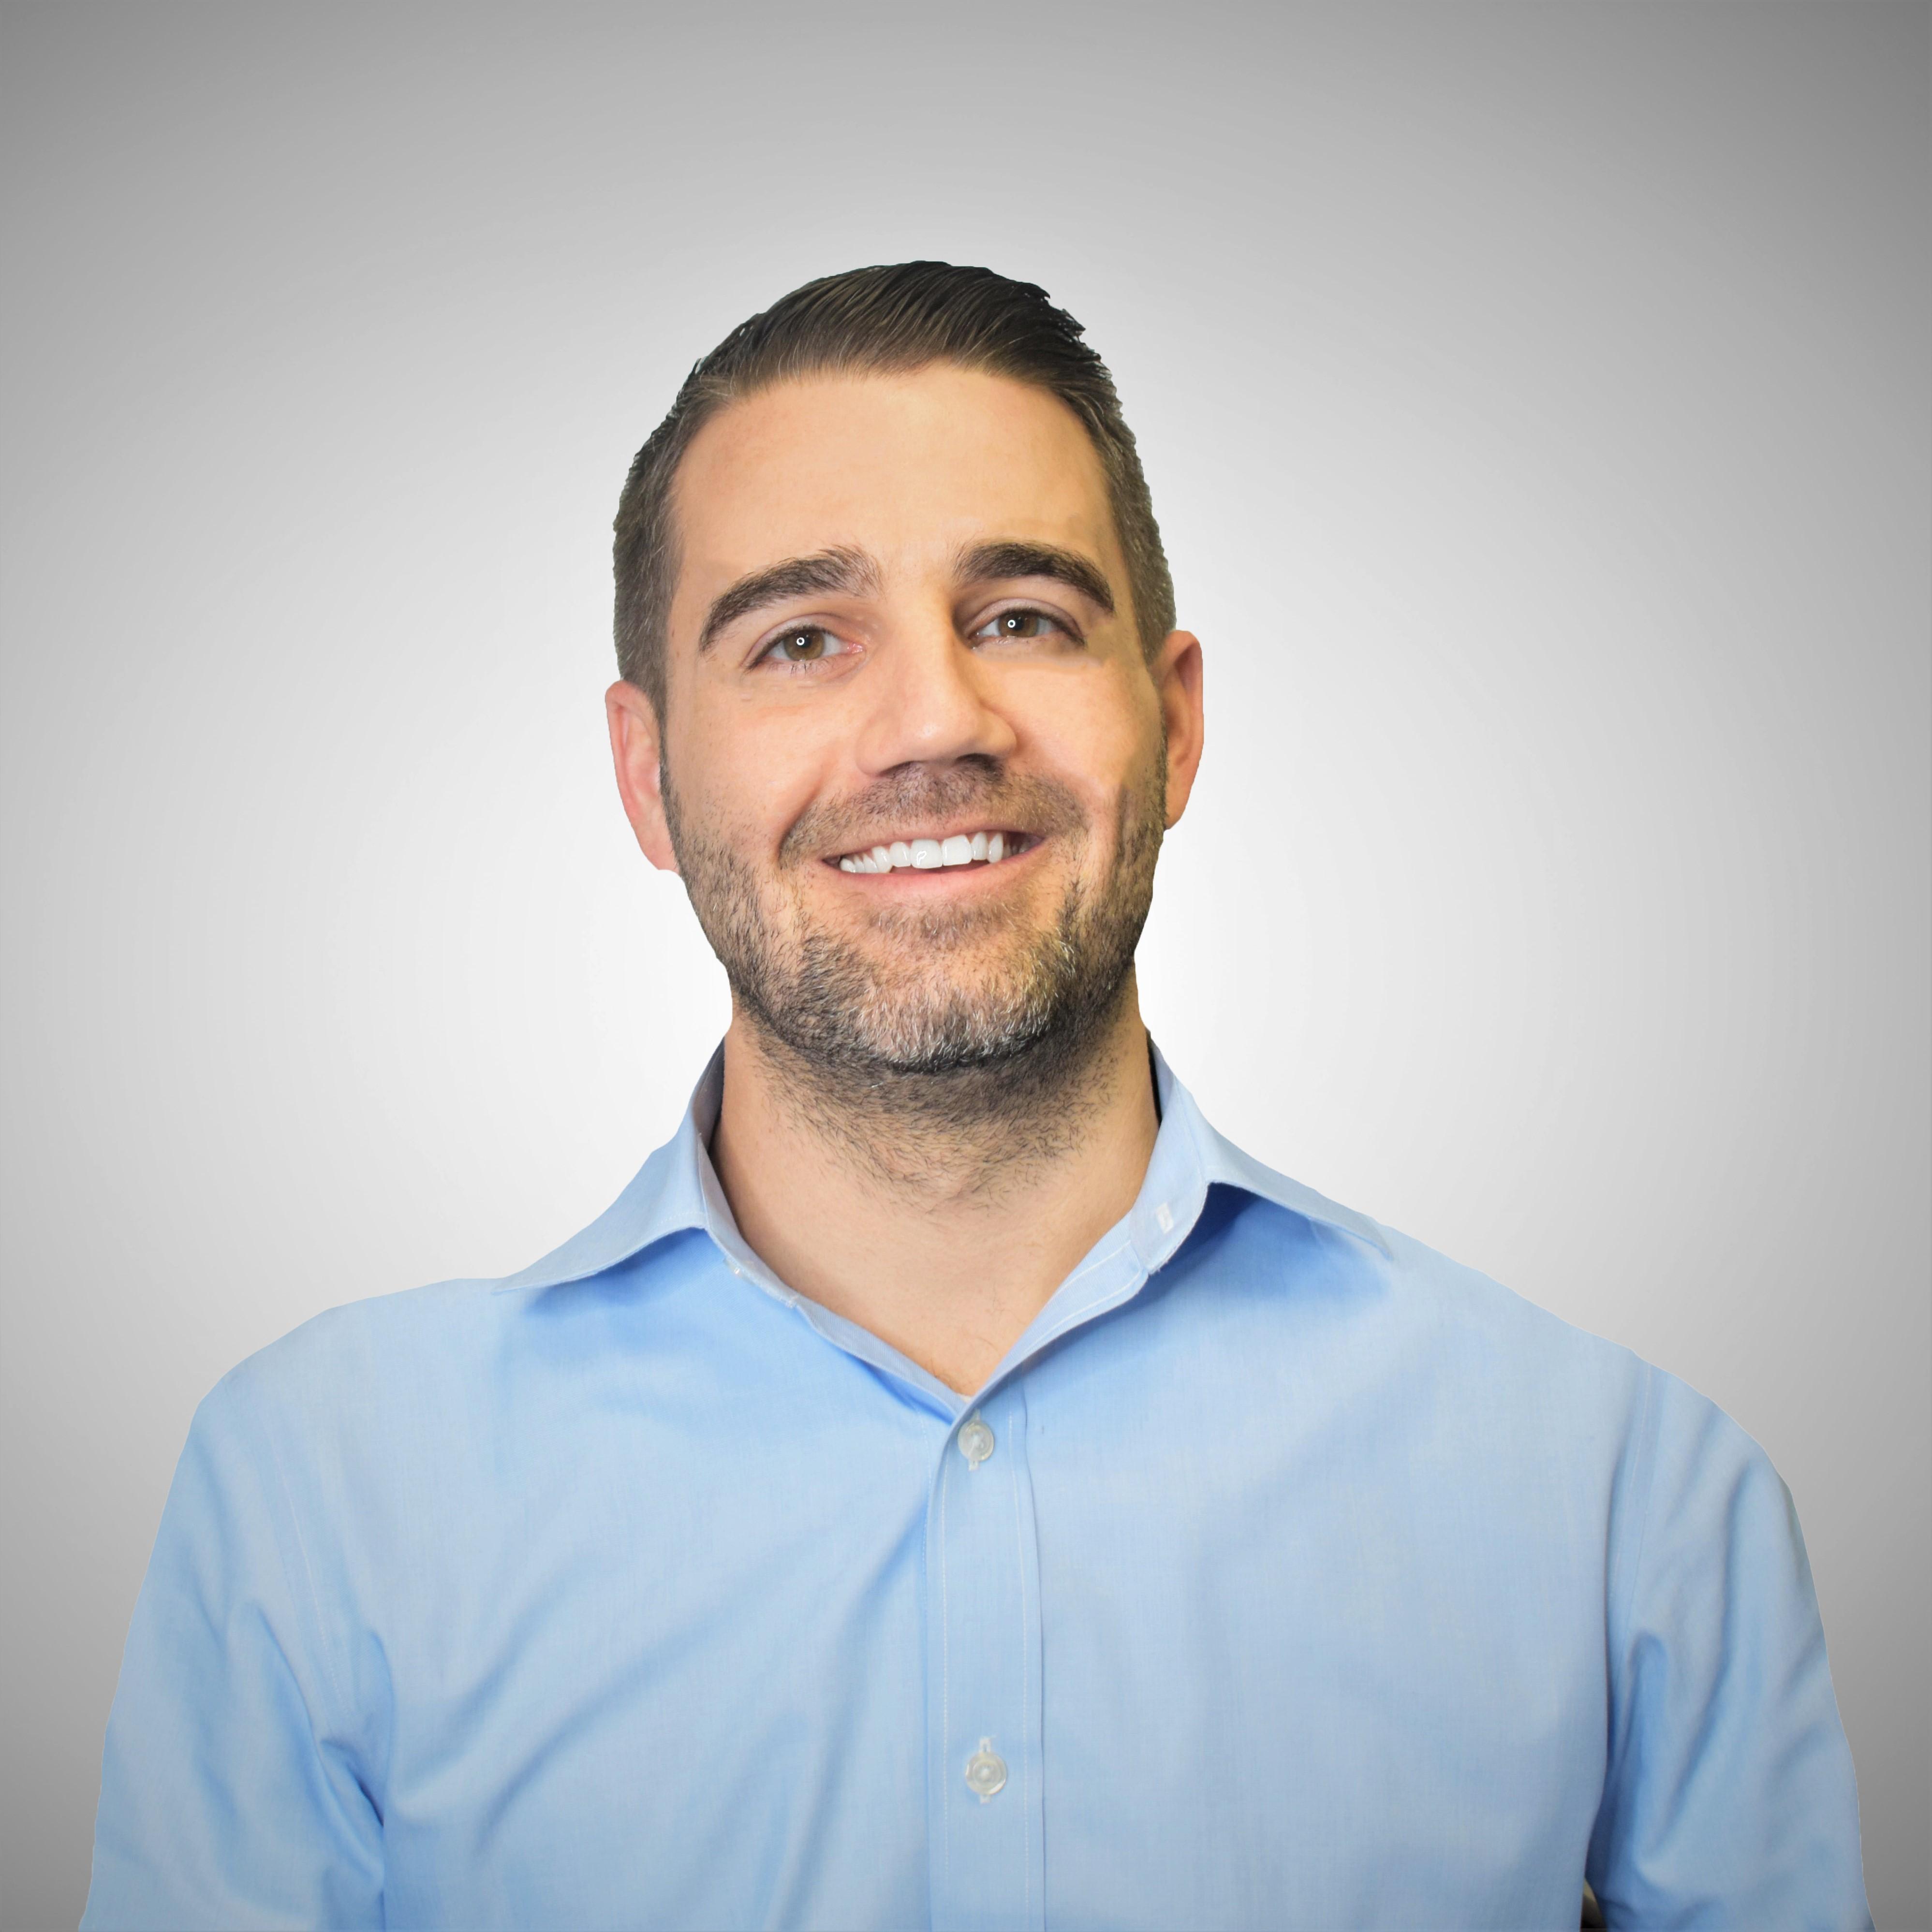 Michael DeLorenzo, MBA